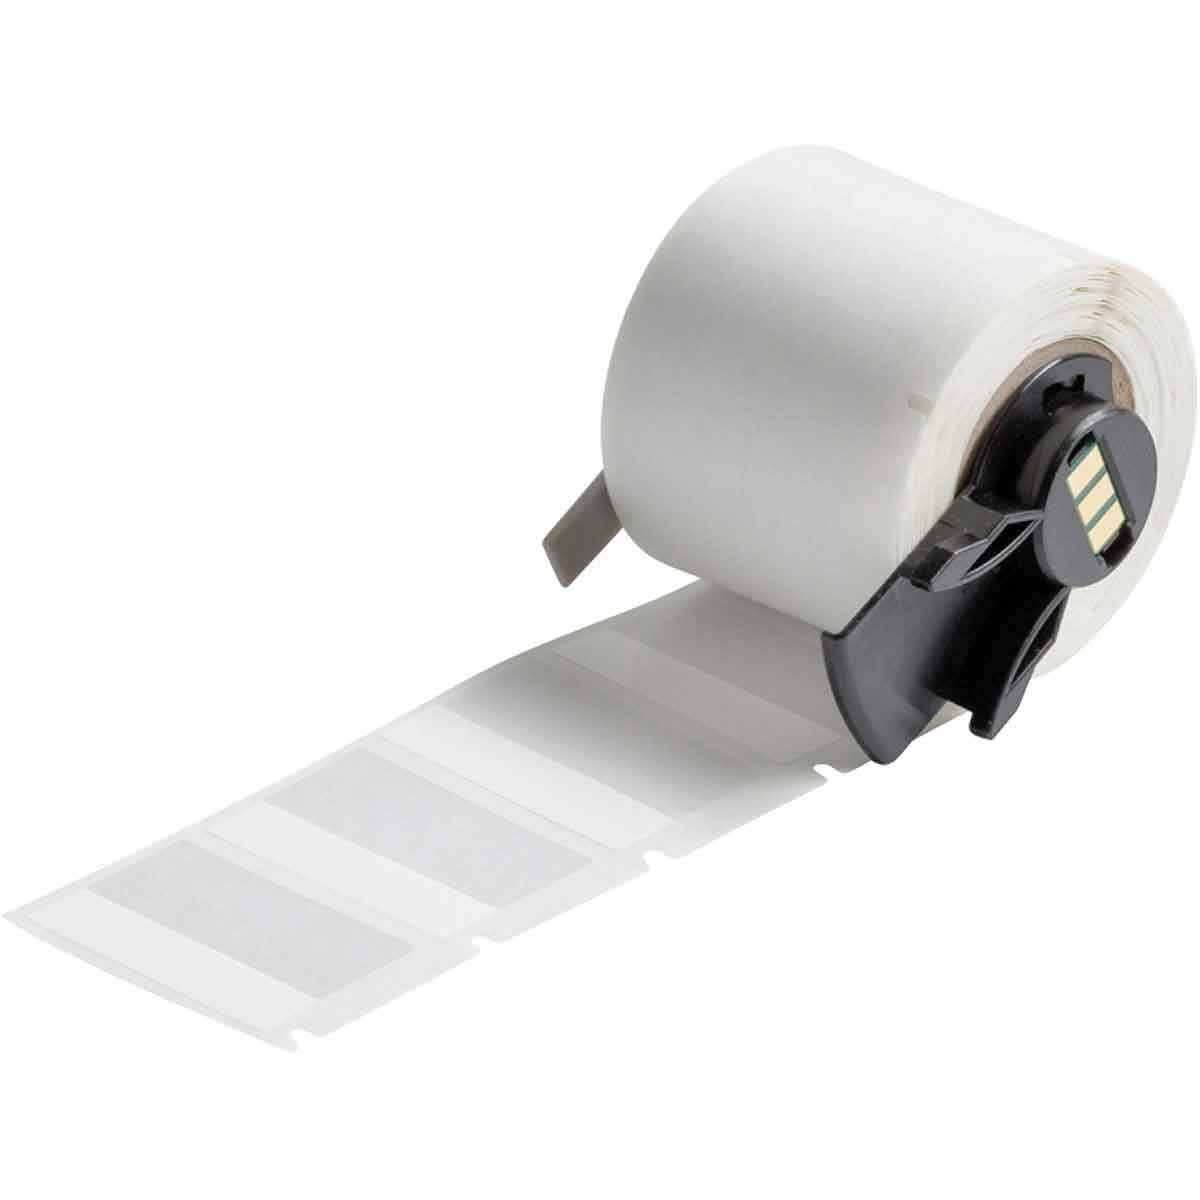 B-427 Self-Laminating Vinyl Brady PTL-30-427-AW TLS 2200 and TLS PC Link 1.5 Width x 0.75 Height 250 per Roll Matte Finish White Label